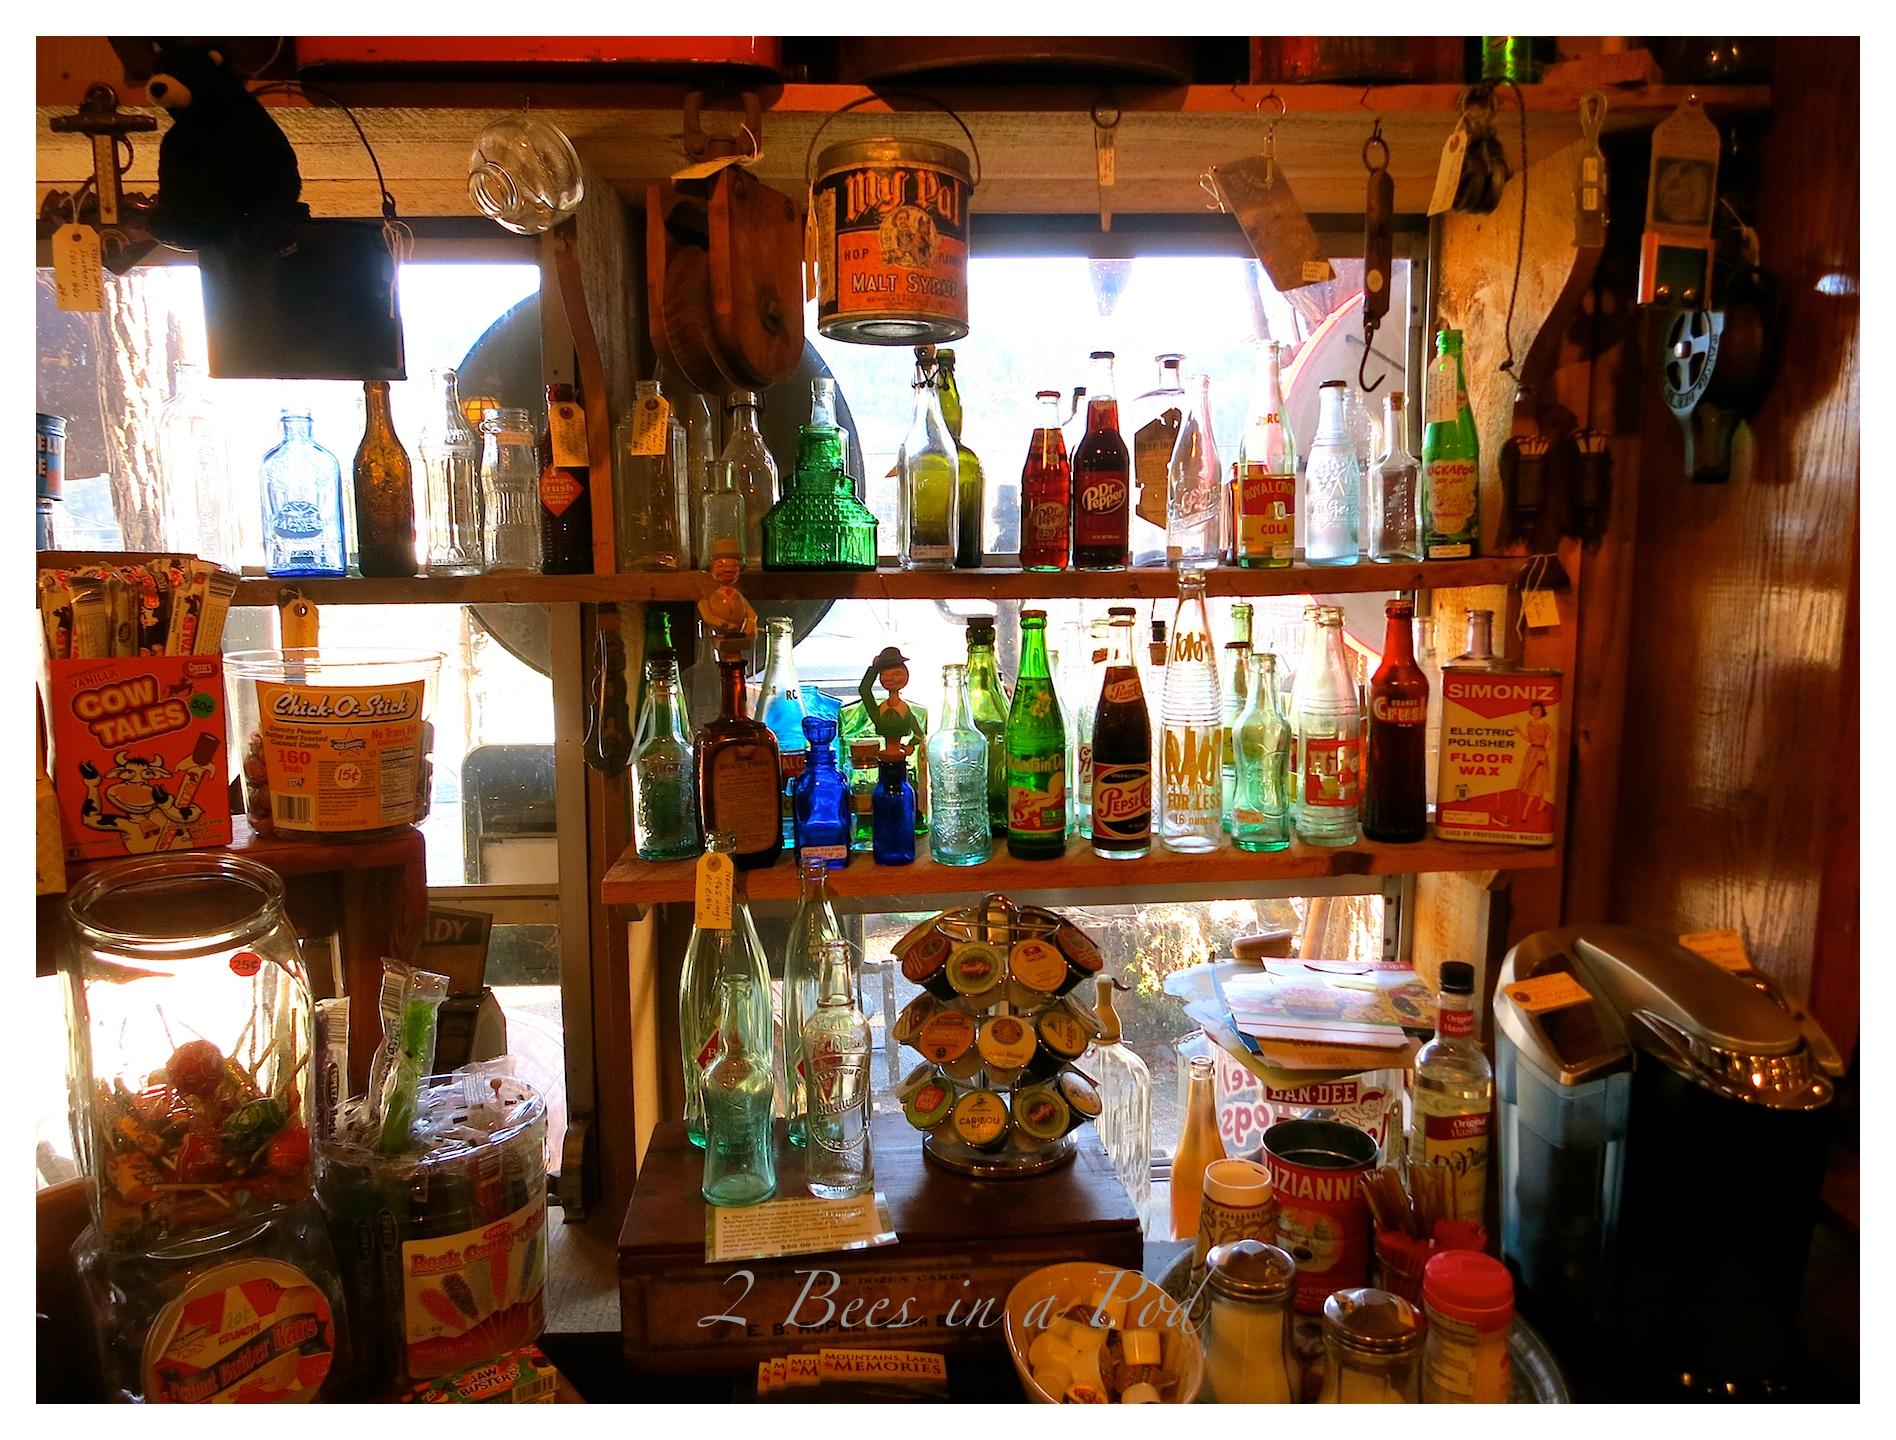 Wonderful antiques and vintage items at Black Bear Creek Antiques in Clayton, Georgia